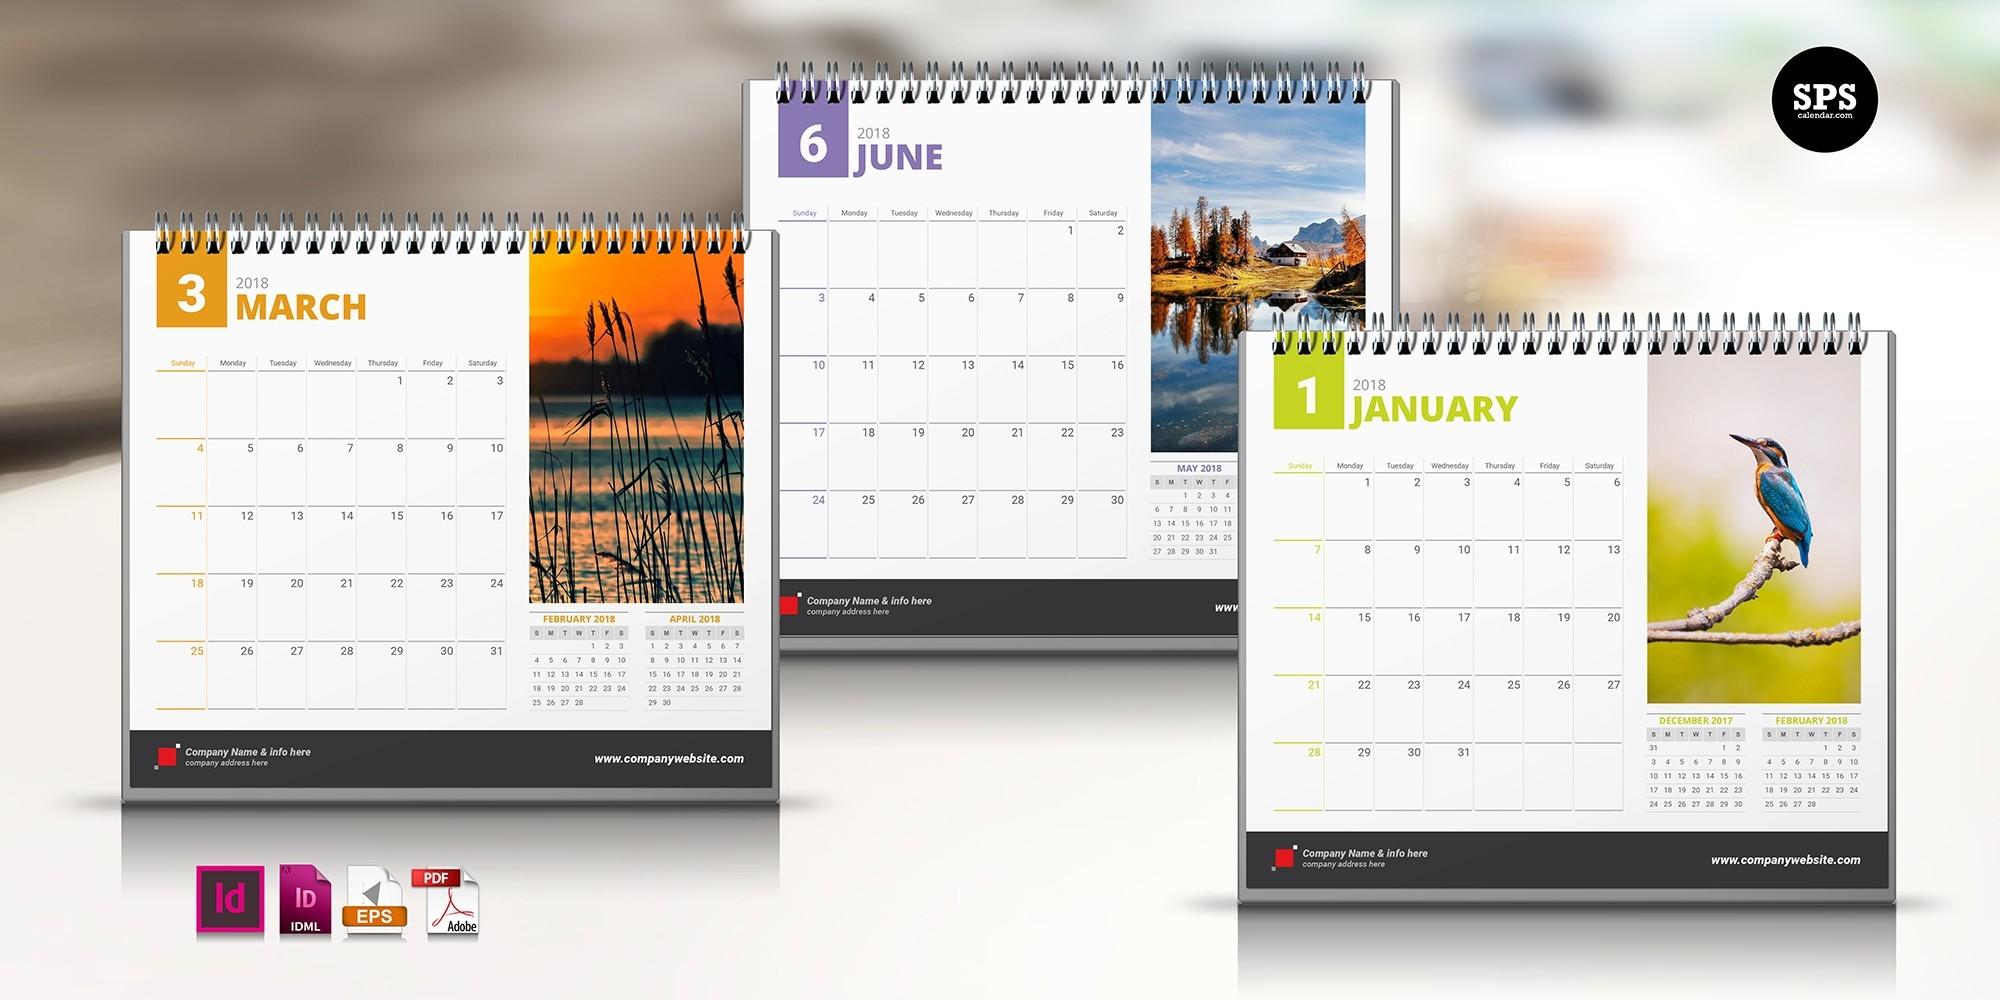 Template Calendar 2018 Indesign Free | Printable Calendar 2019-Calendar Template Indesign Free